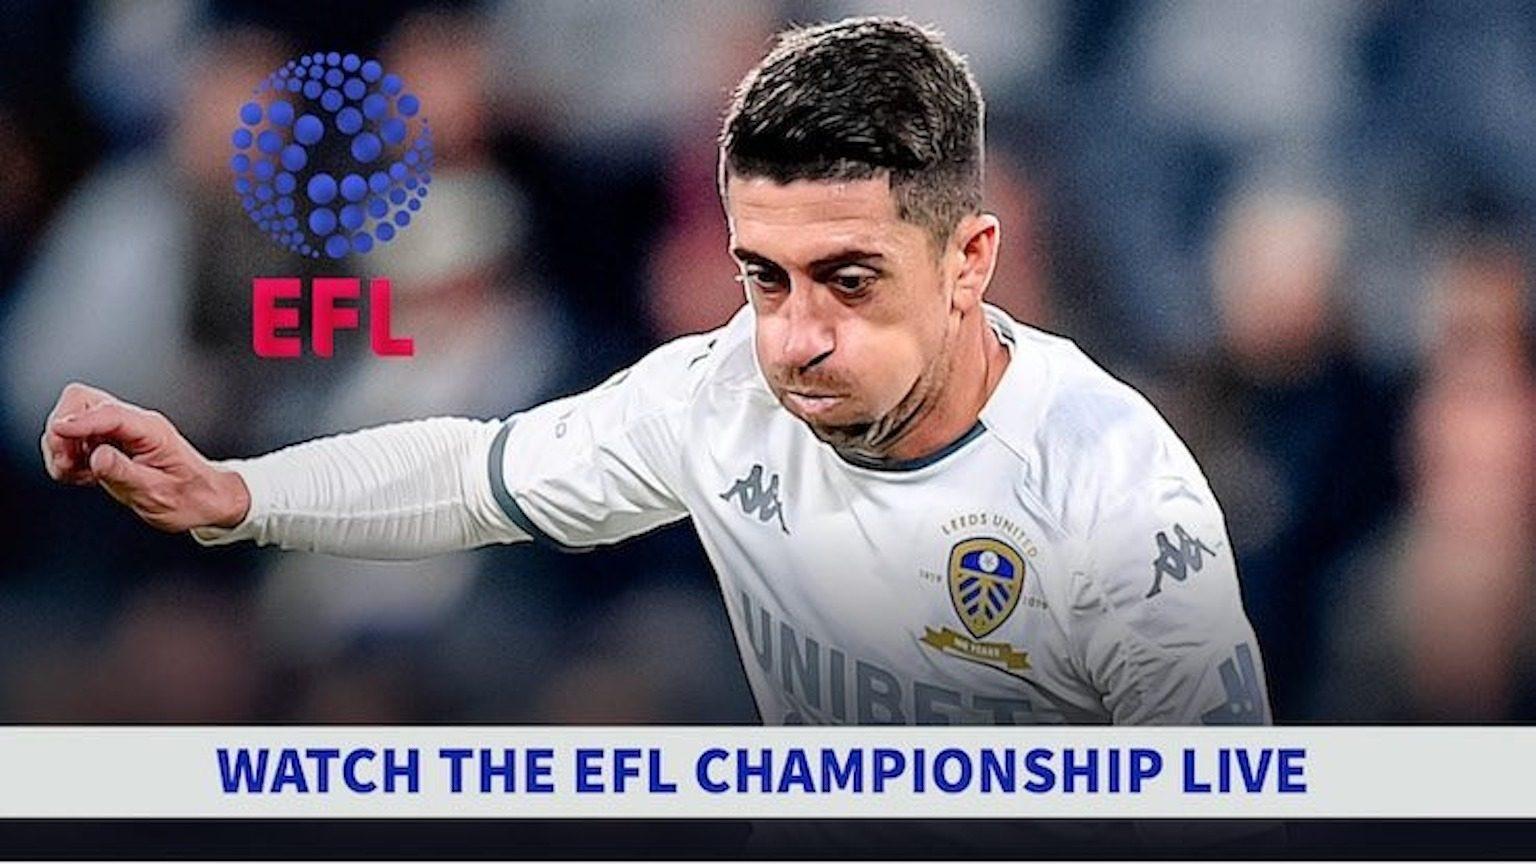 EPL Championship